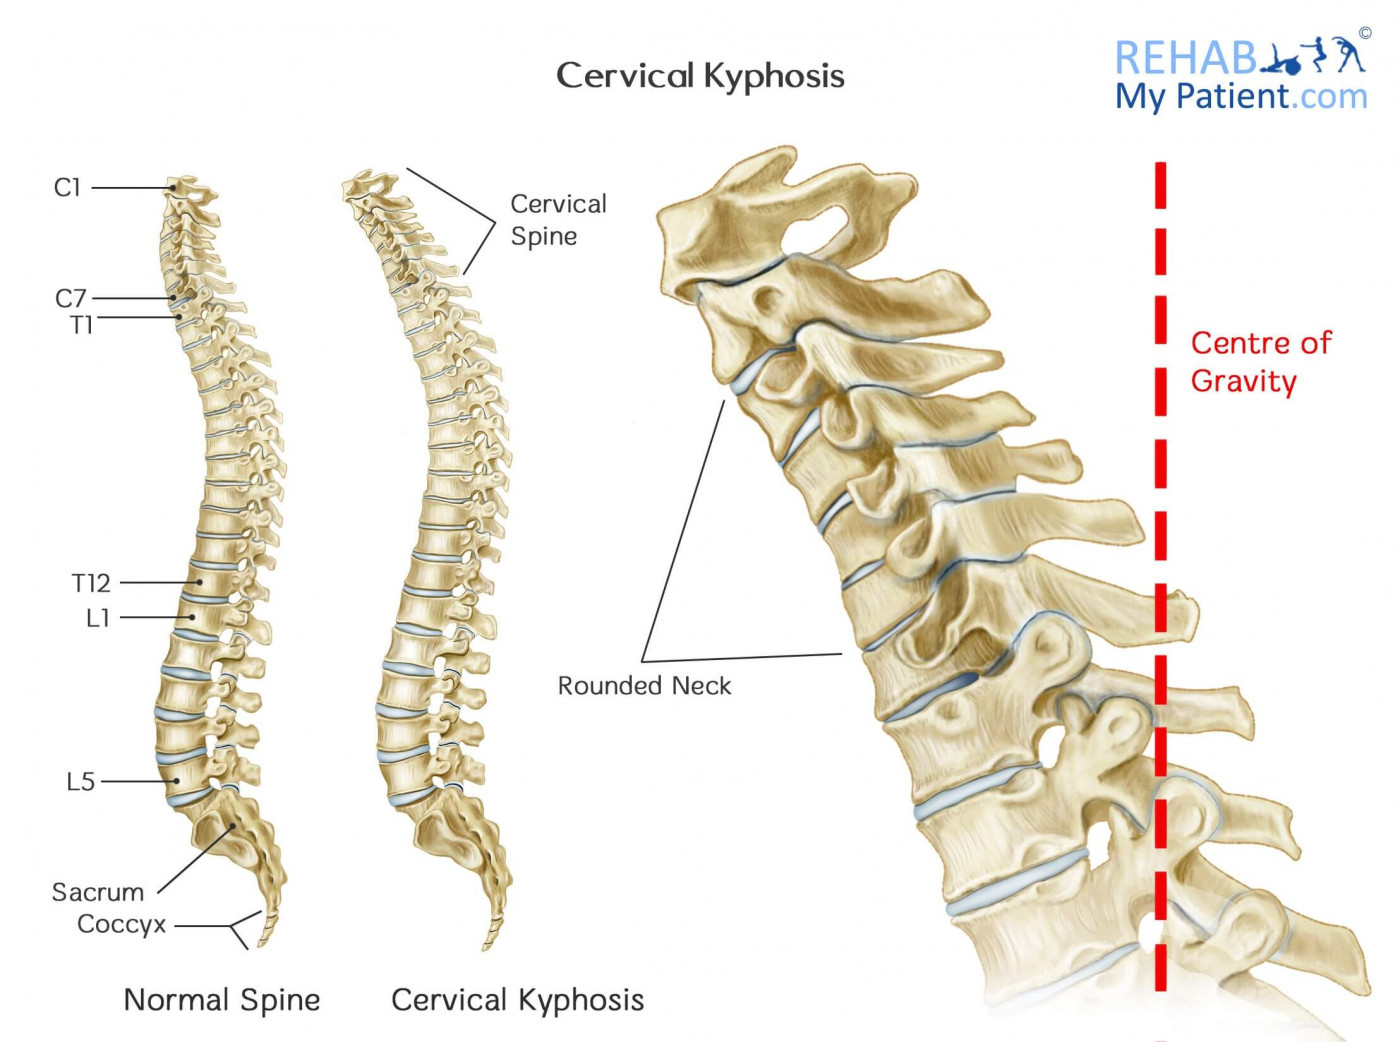 Cervical Kyphosis Rehab My Patient